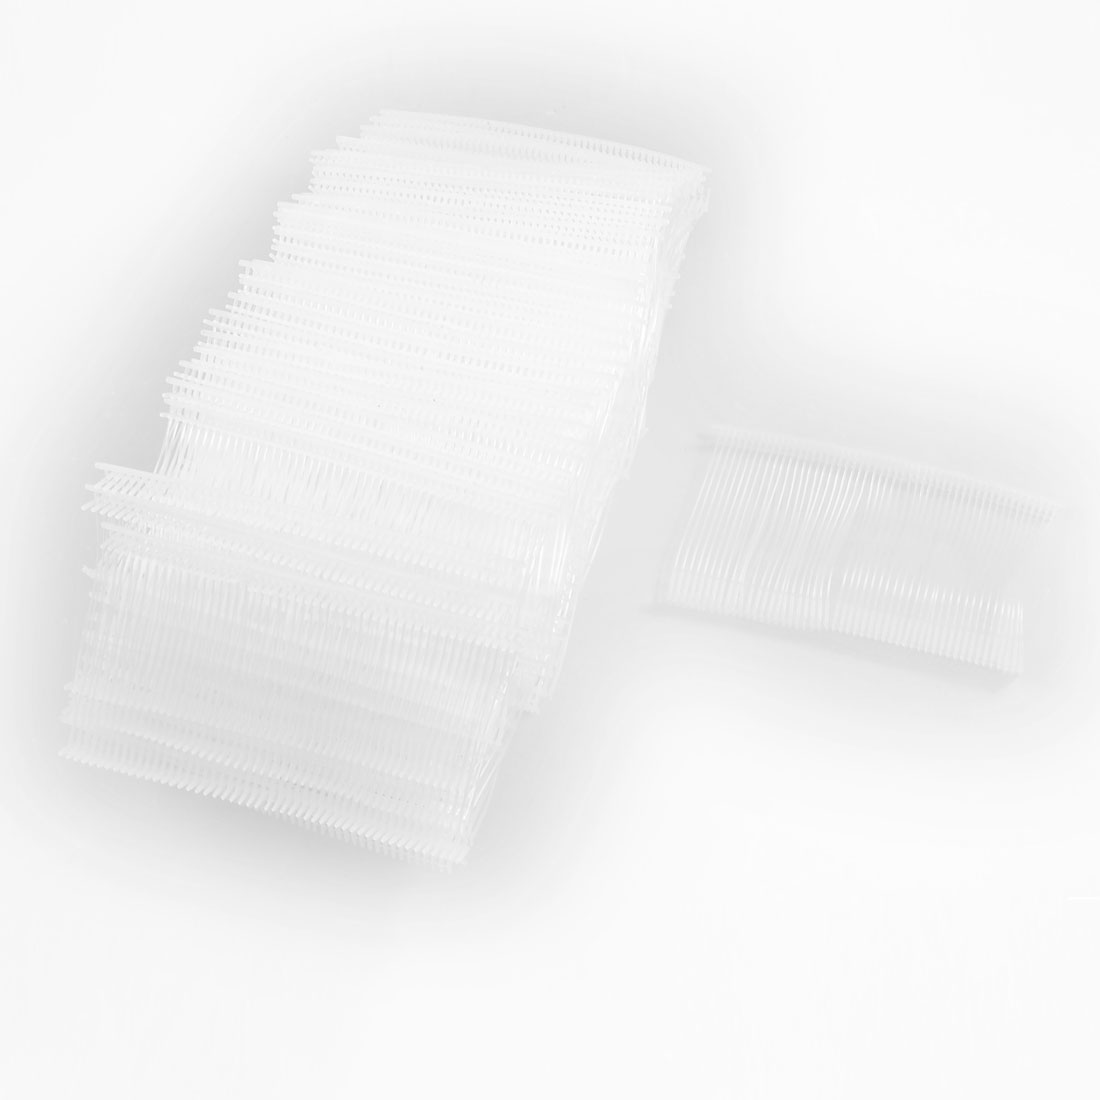 5000 x Label Price Tagging Tag Gun Barbs Fastener Pin 50mm